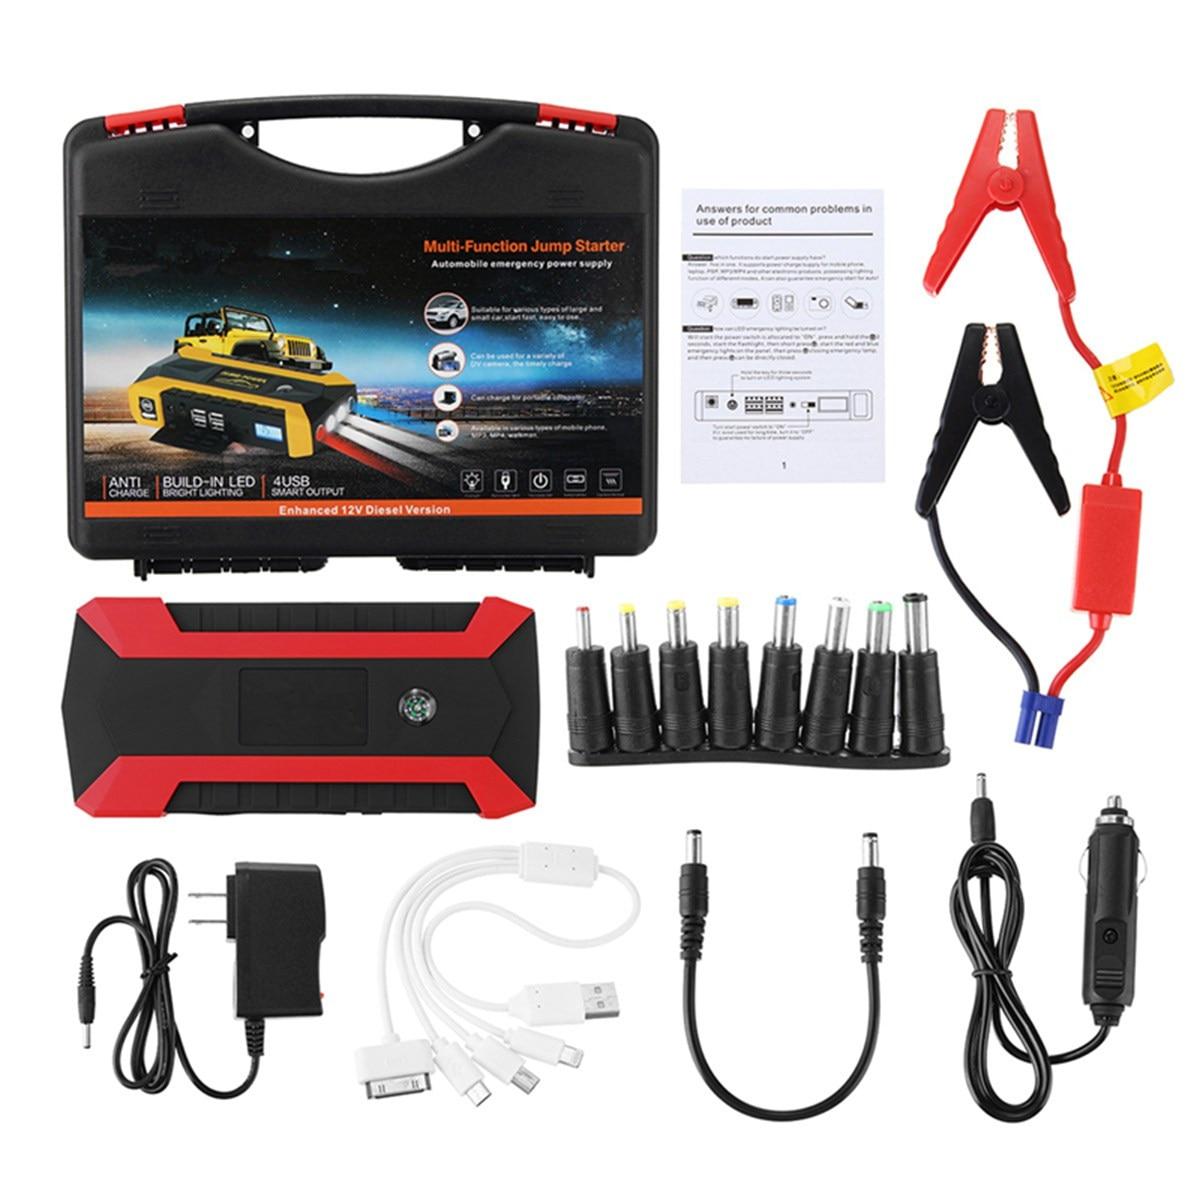 Newest 89800mAh Multifunction 1set Car Charger font b Battery b font Jump Starter 4USB LED Light